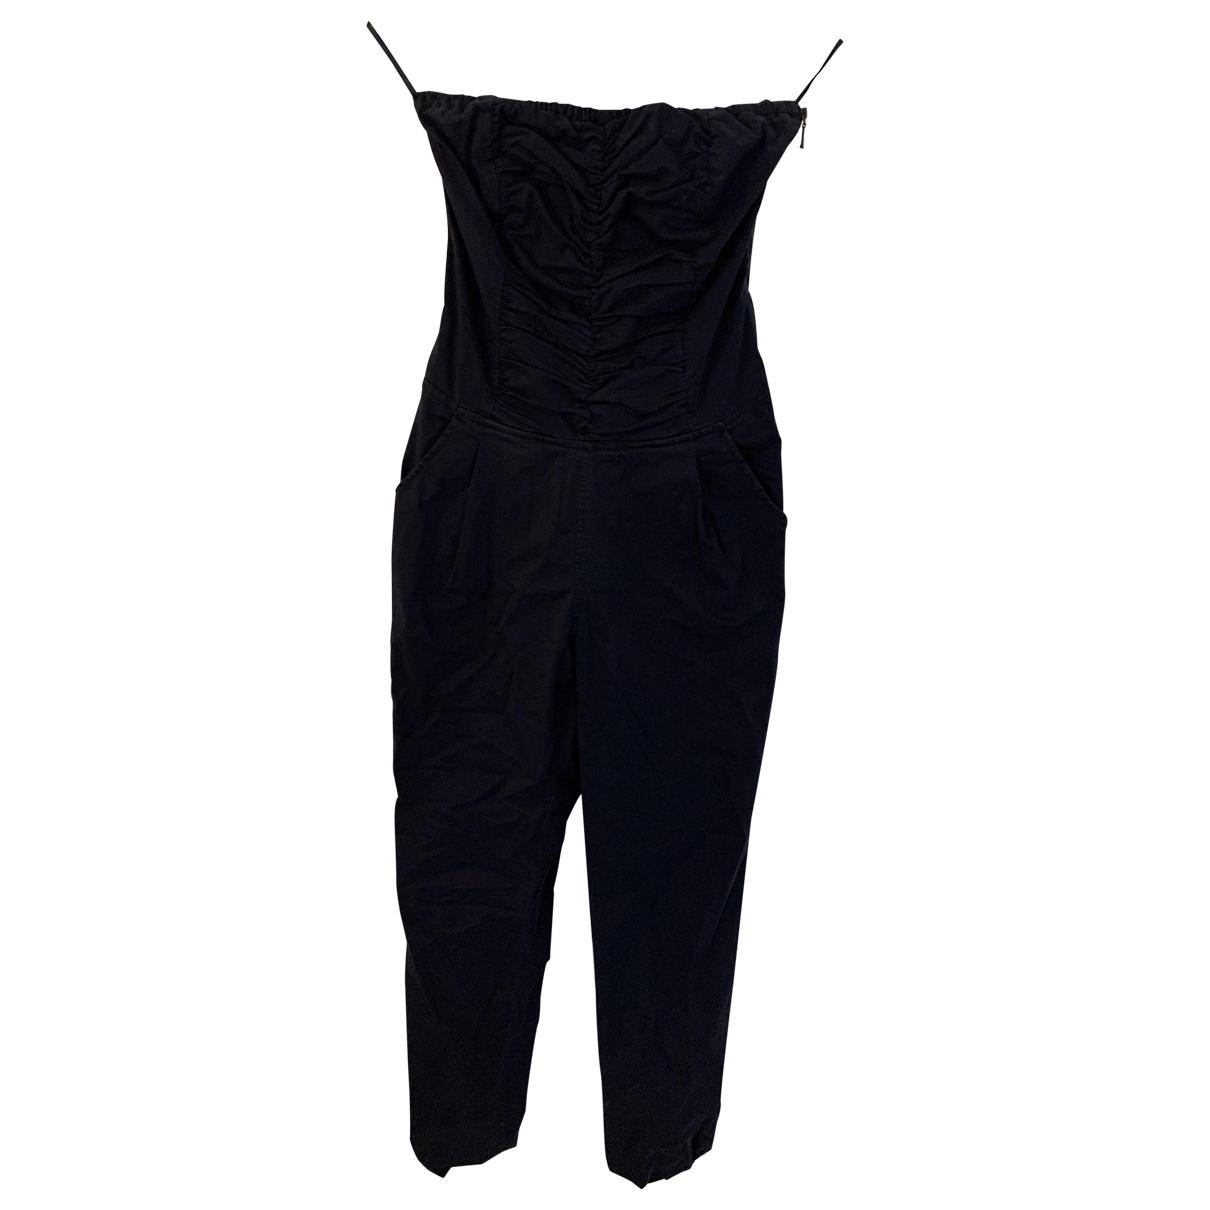 Guess \N Blue Cotton jumpsuit for Women S International